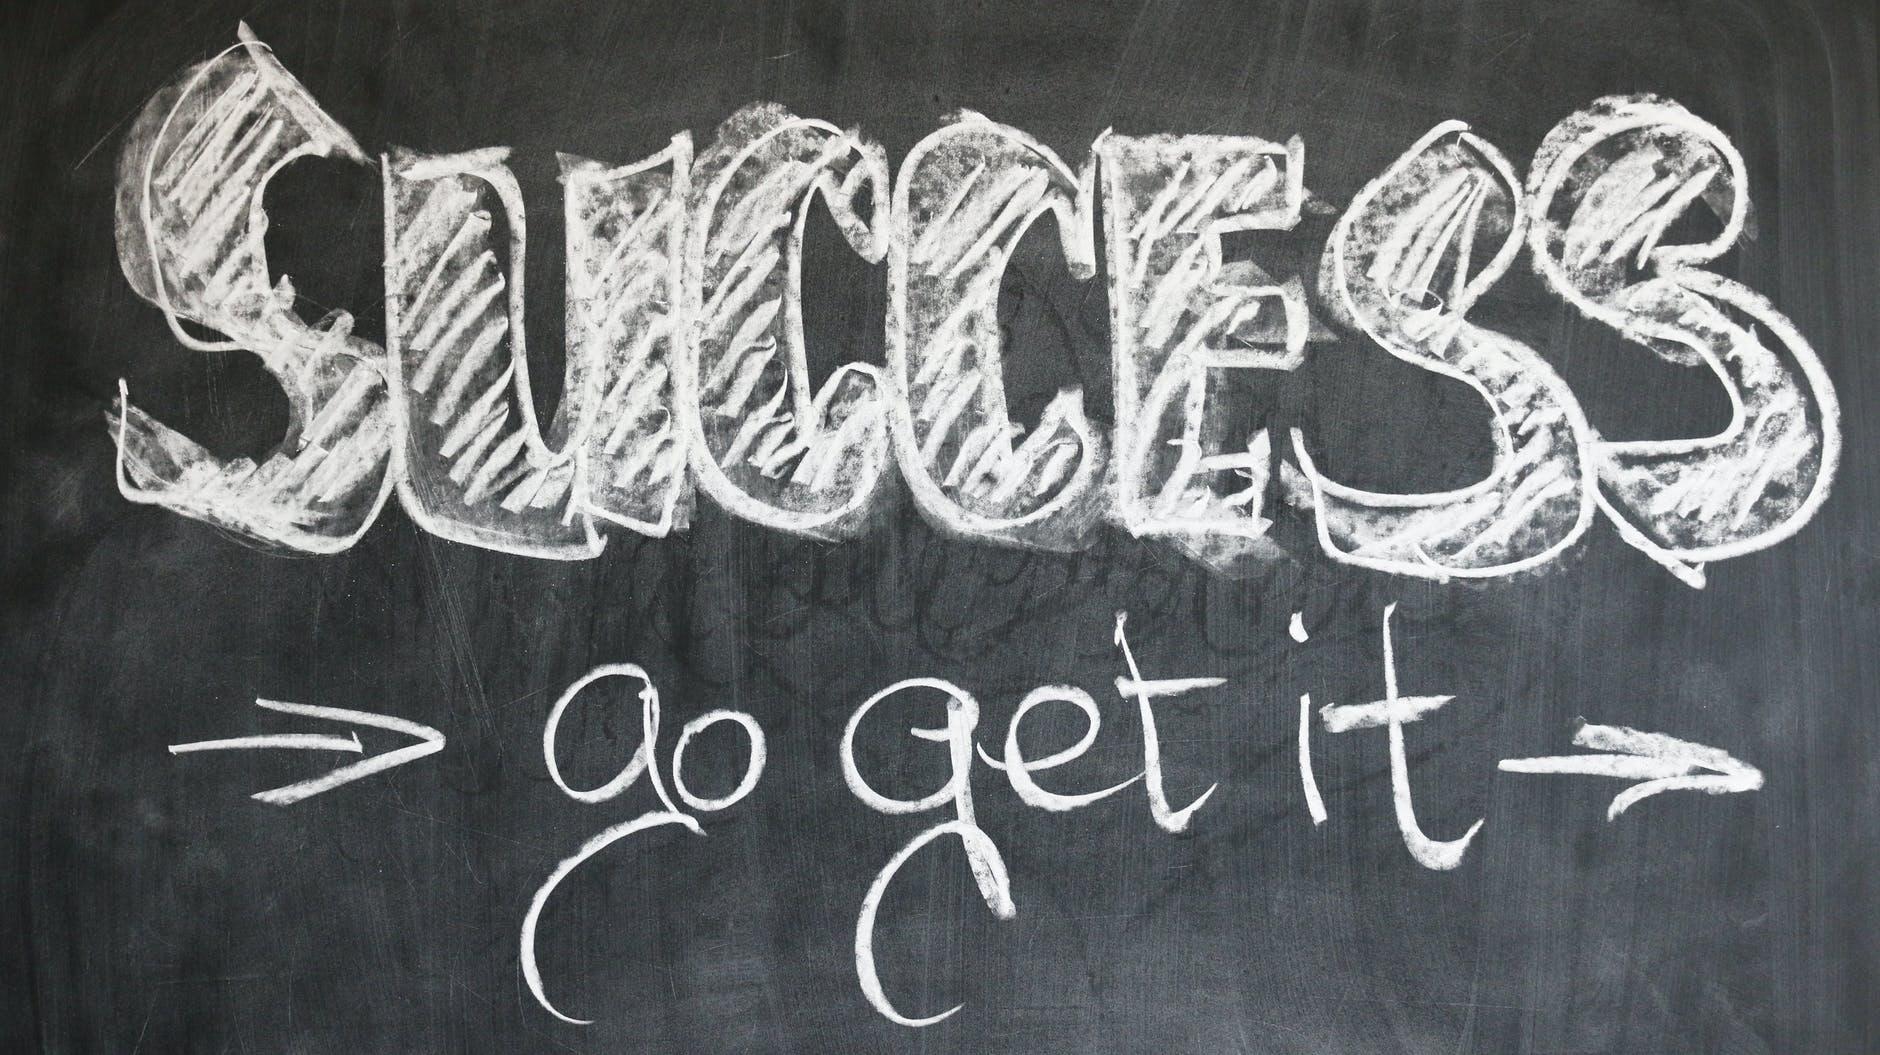 Ce il motiveaza pe un angajat valoros?